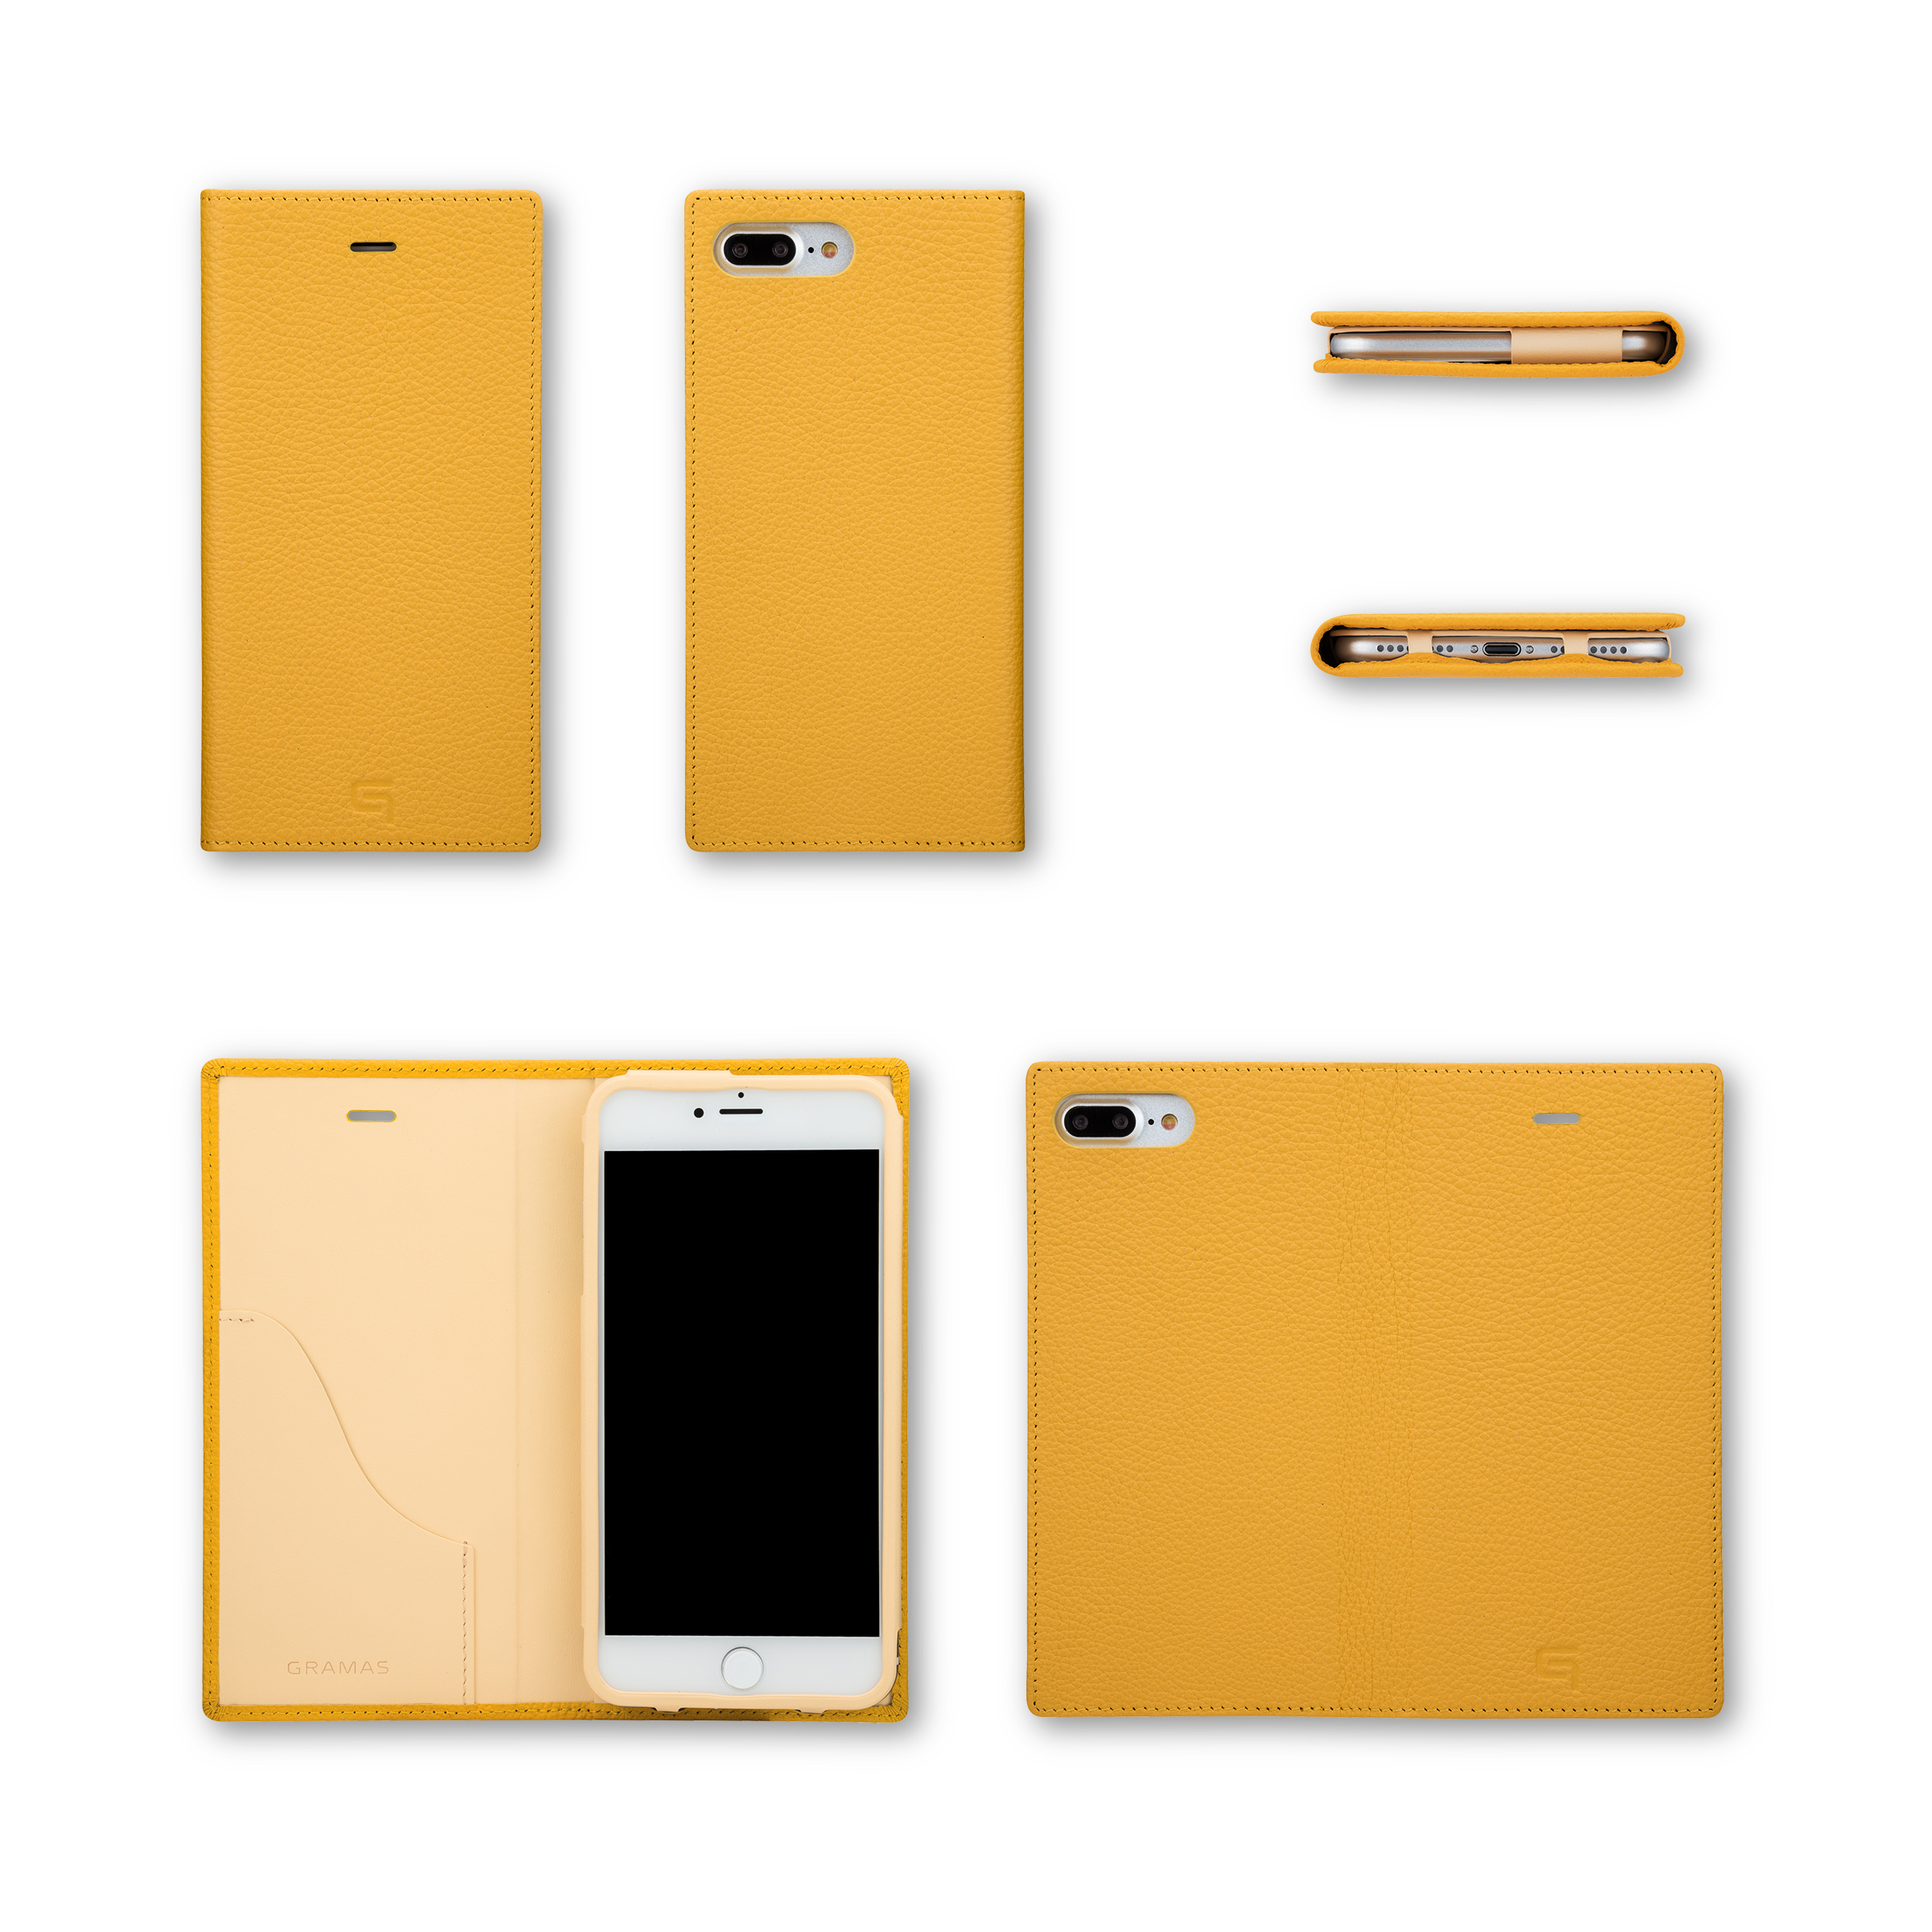 GRAMAS Shrunken-calf Full Leather Case for iPhone 7 Plus(Purple) シュランケンカーフ 手帳型フルレザーケース - 画像5